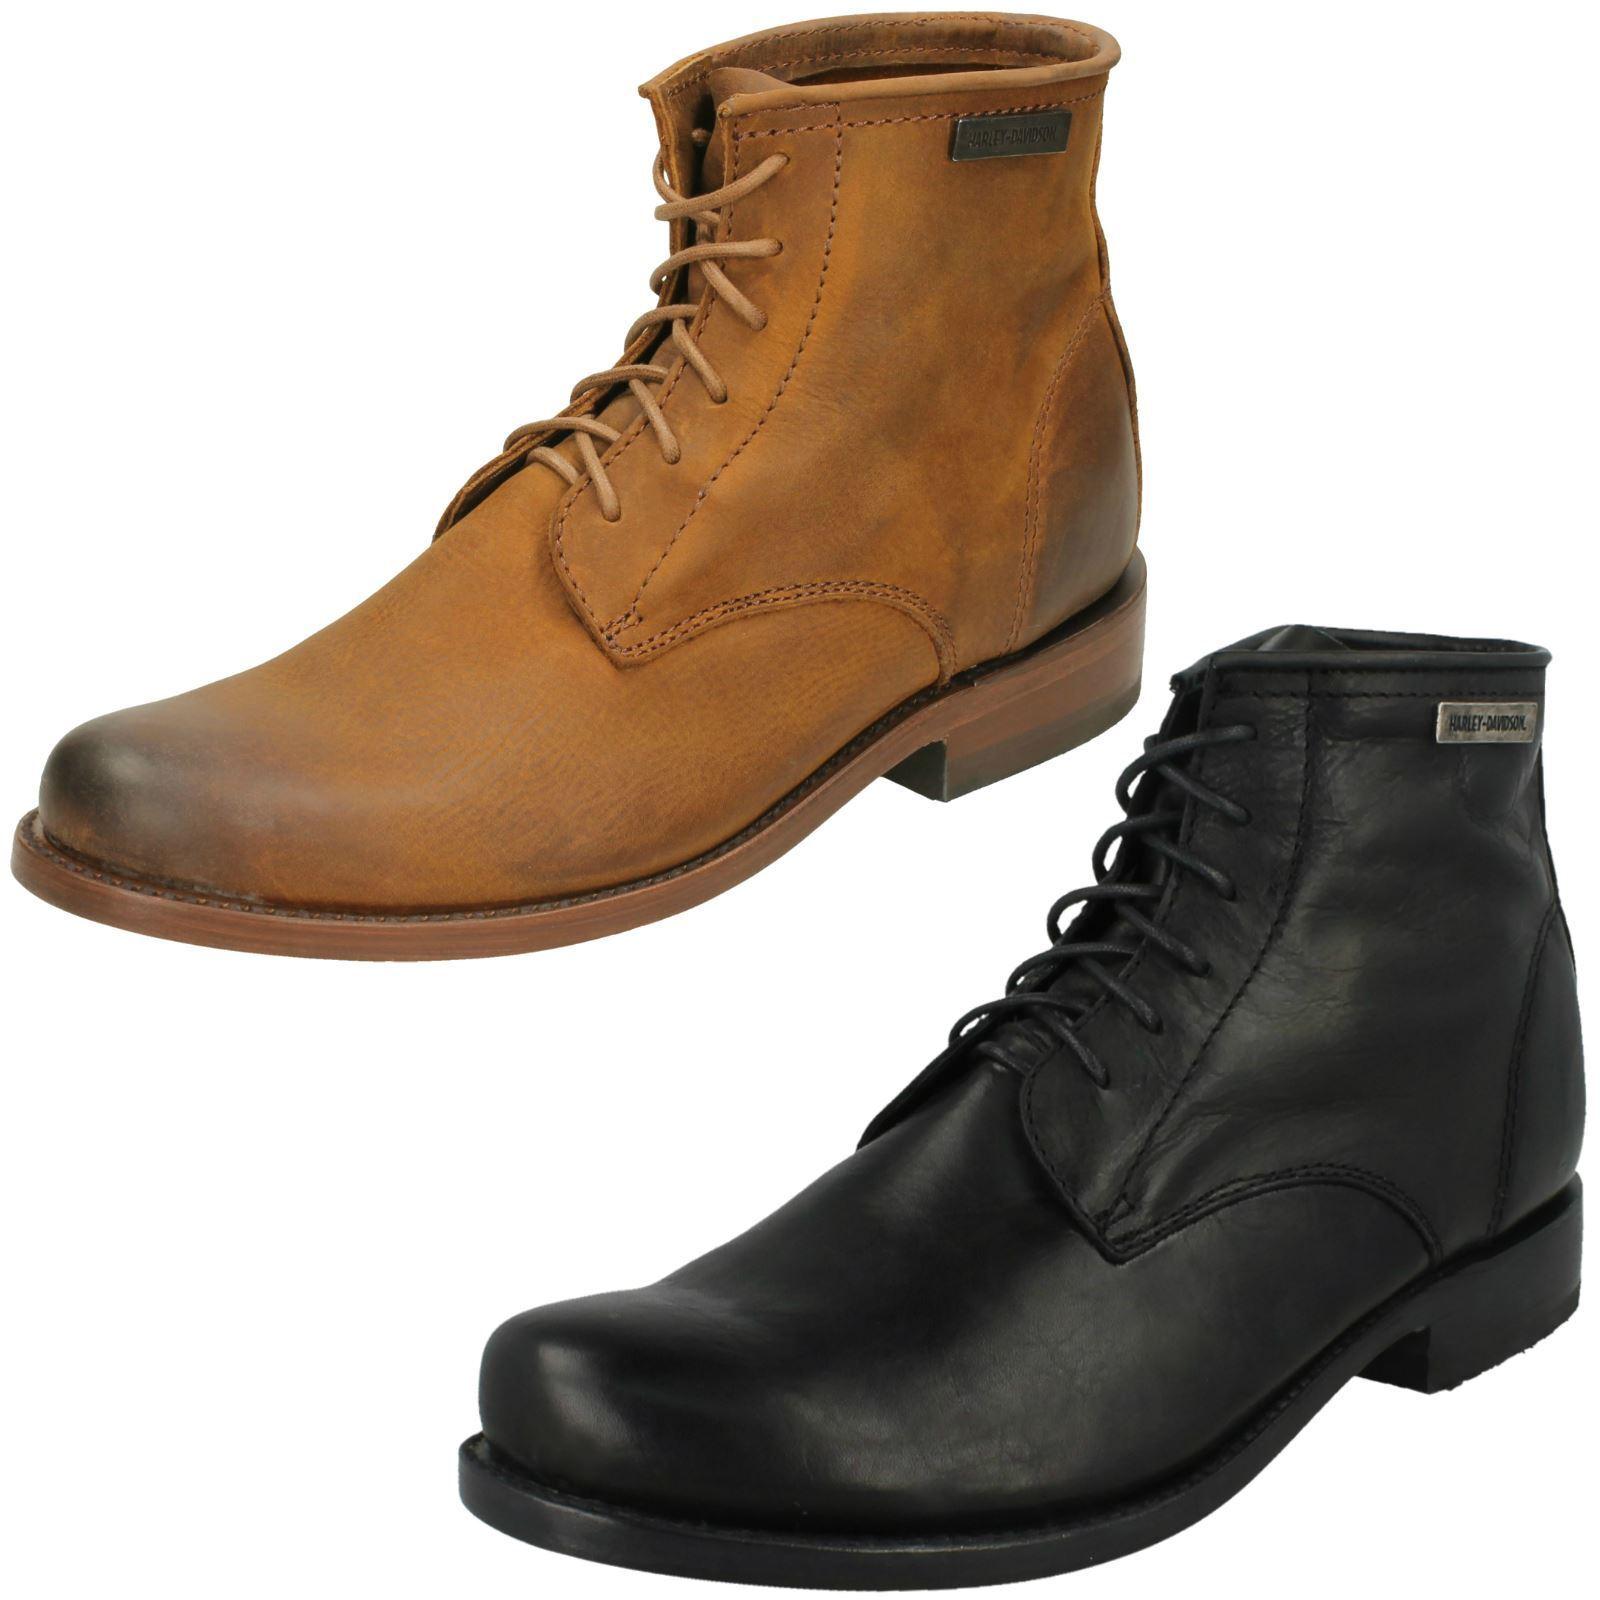 Mens Harley Davidson Ankle Boots - Tarrson